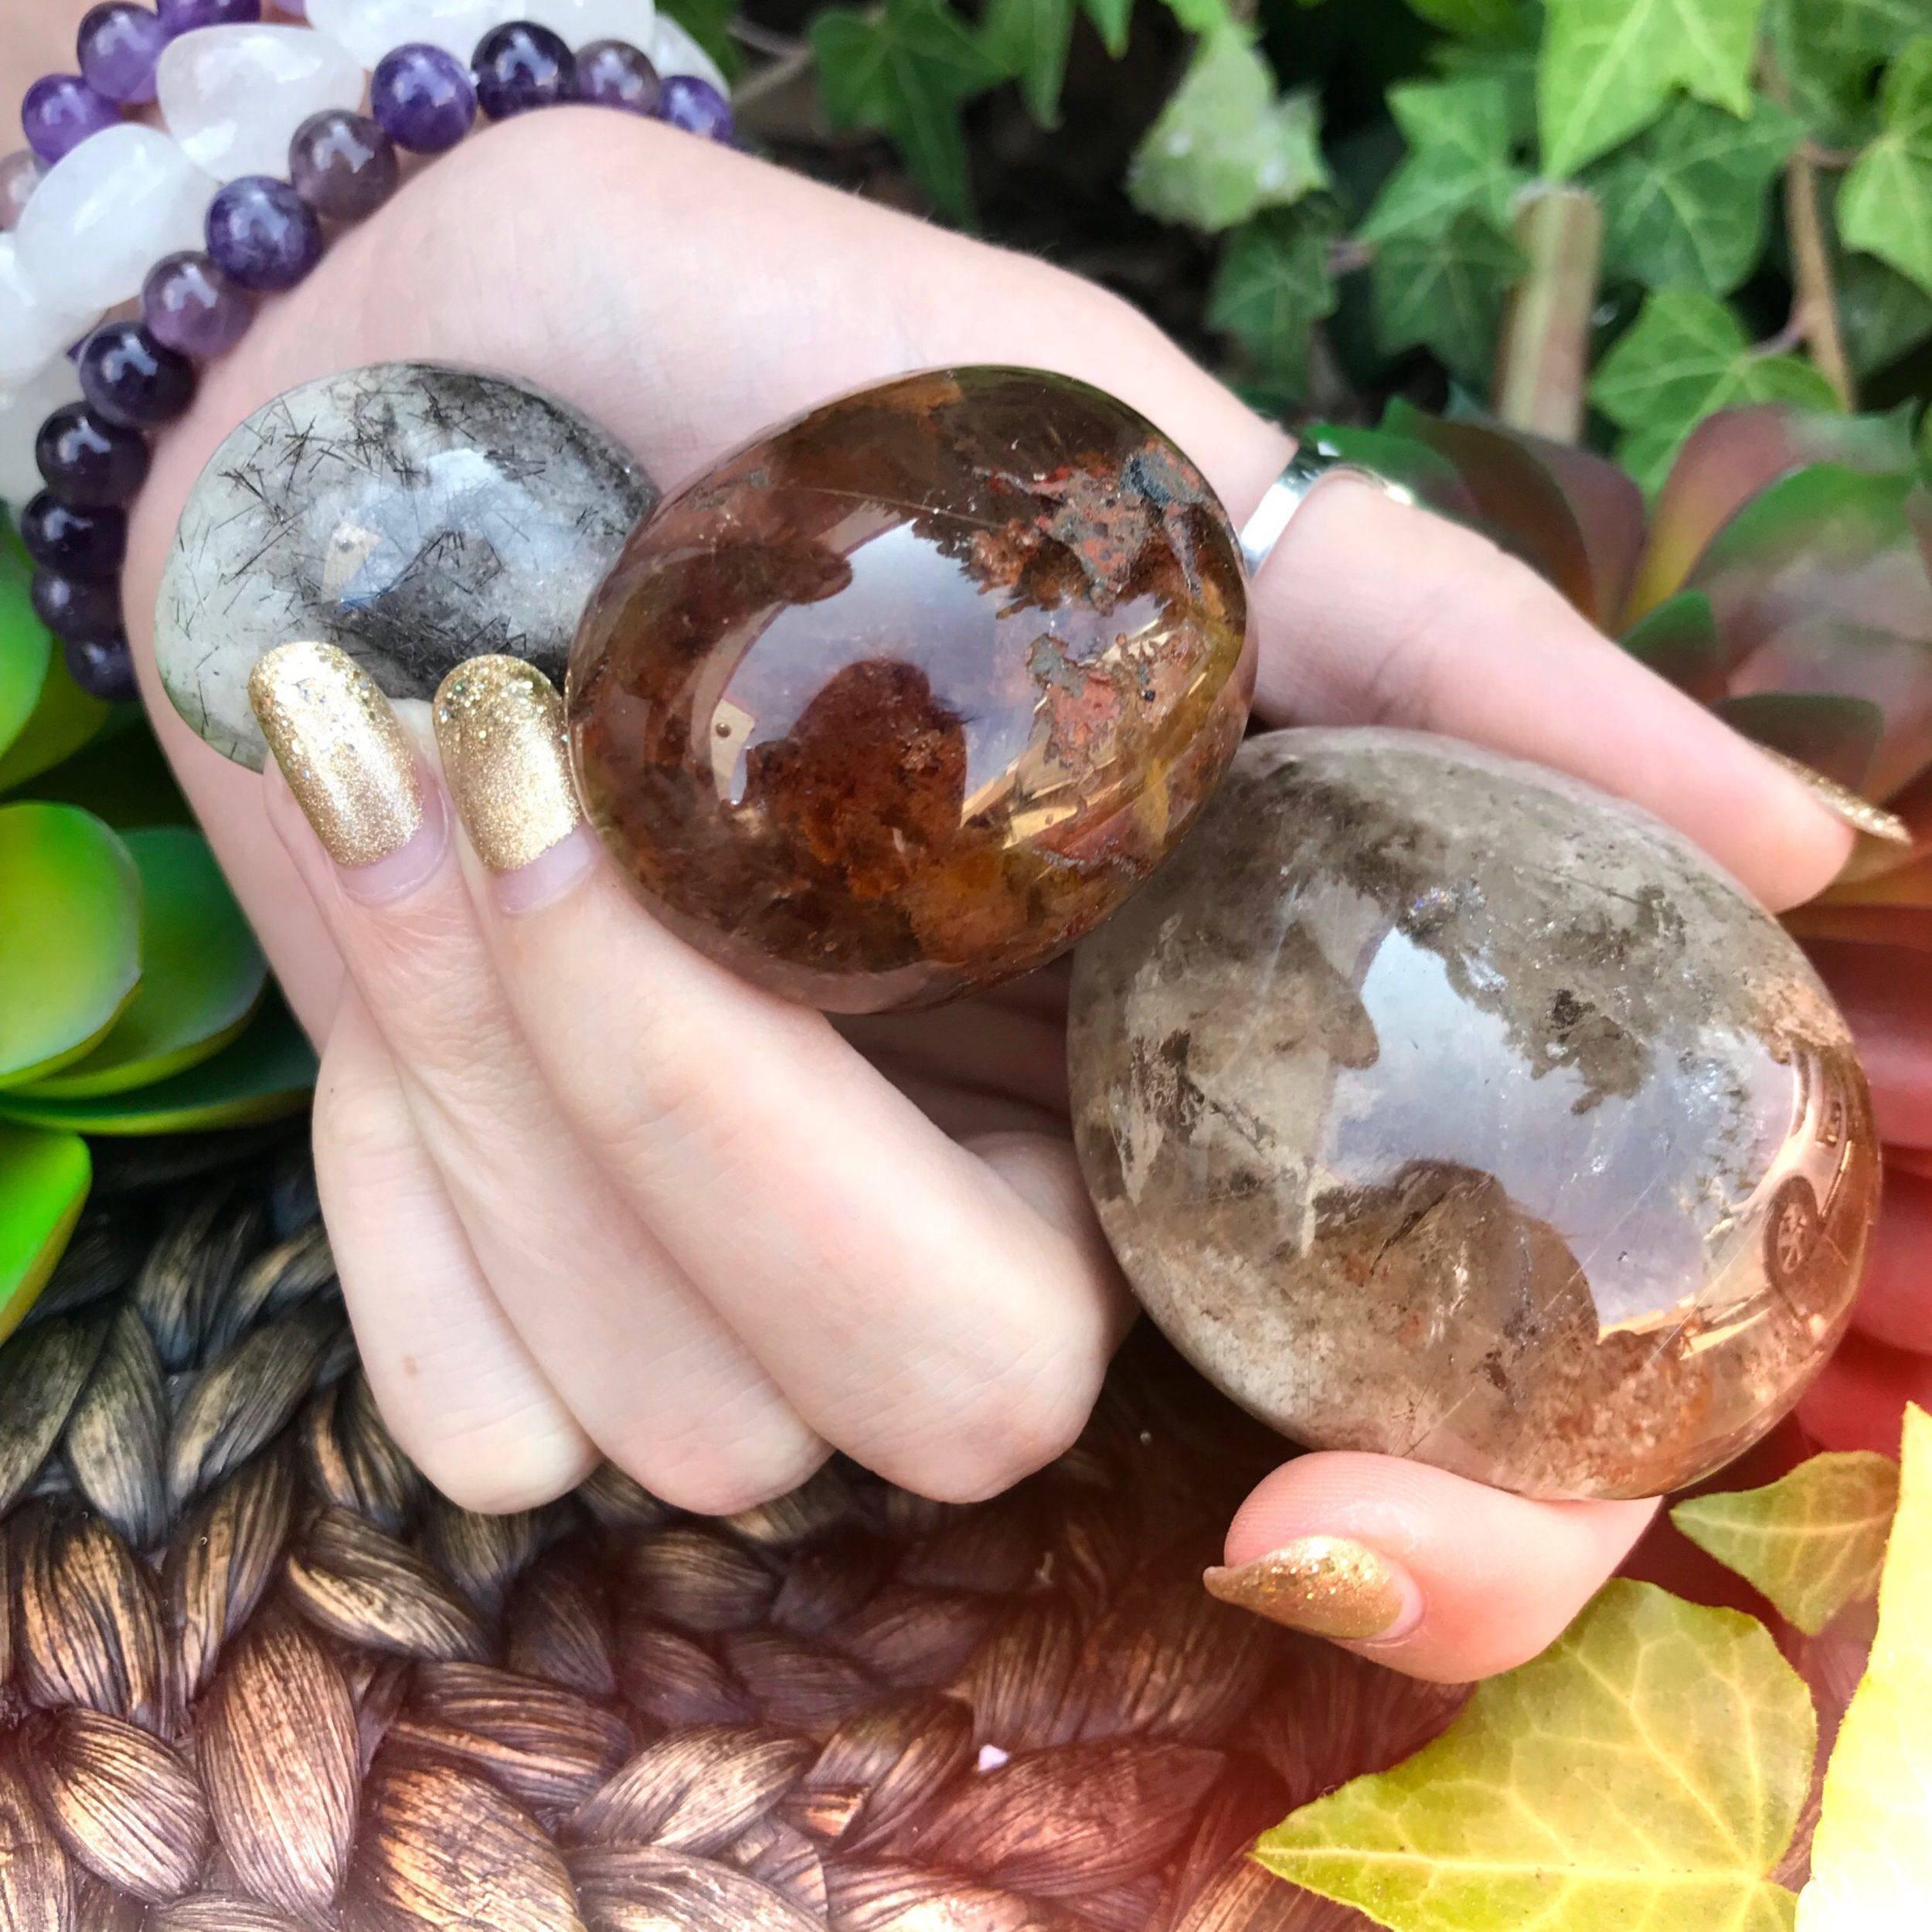 Rutilated_Shamans_Dream_Stones_2of3__8_29